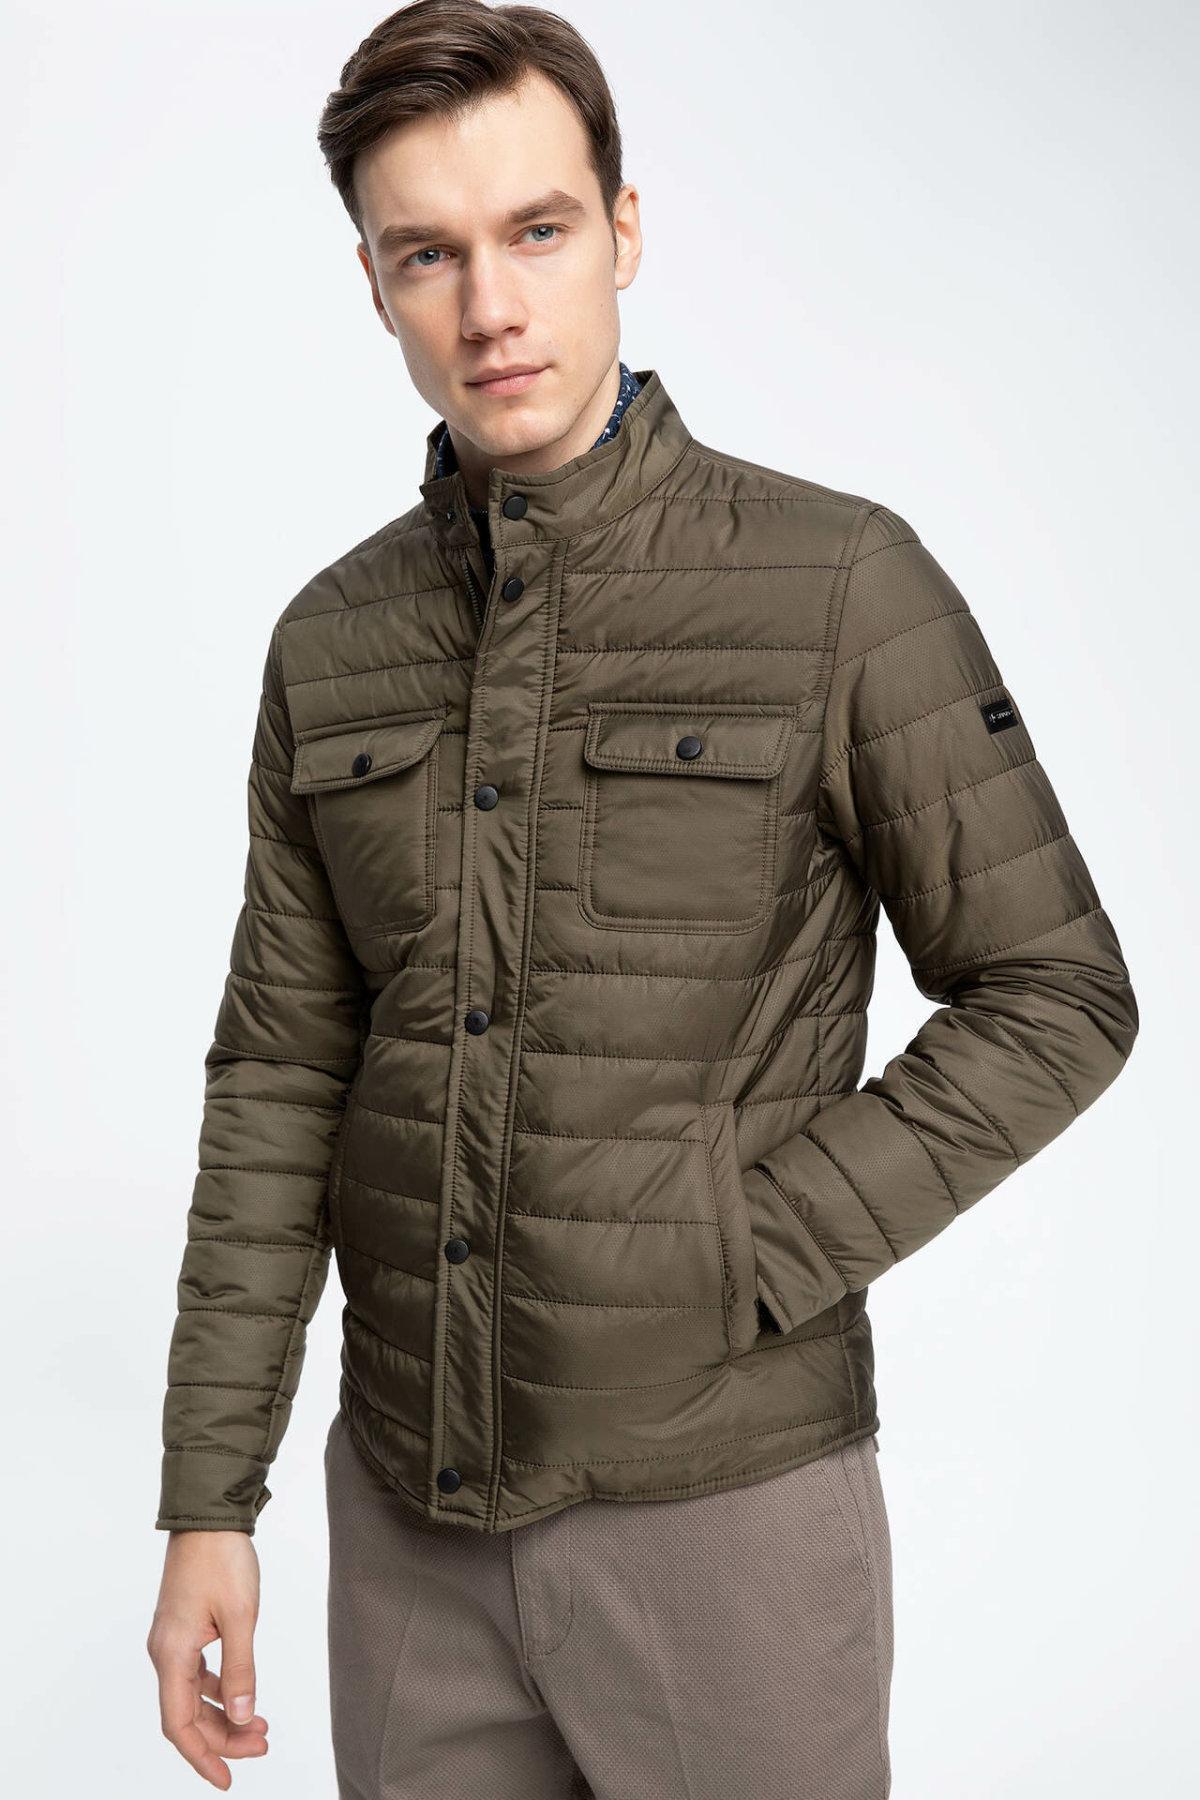 DeFacto Man Spring Cotton Coats Man Casual Army Green Thick Parka Coats Male Zipper Pockets Decors Mont Tops-J9543AZ19SP